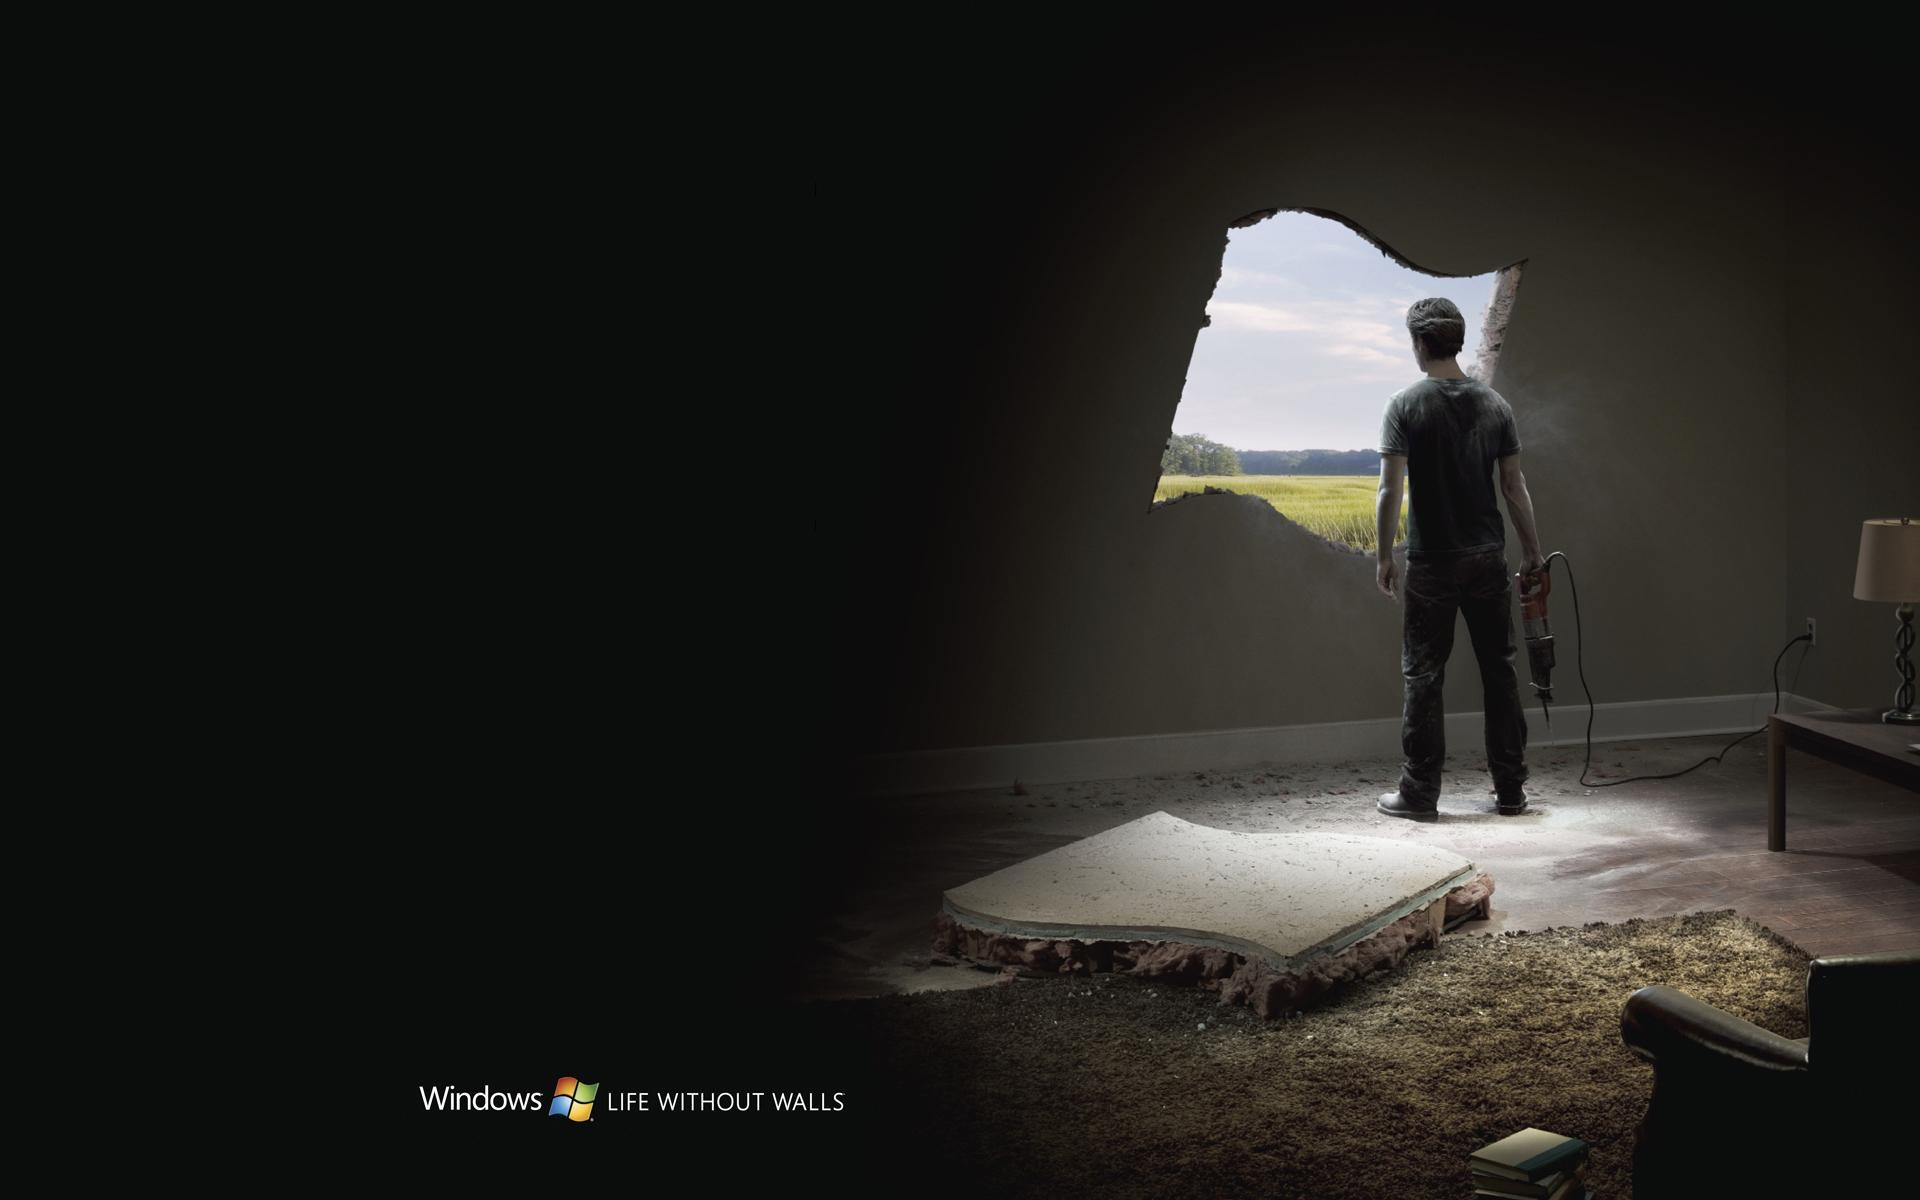 Windows Server Wallpapers (31 Wallpapers)